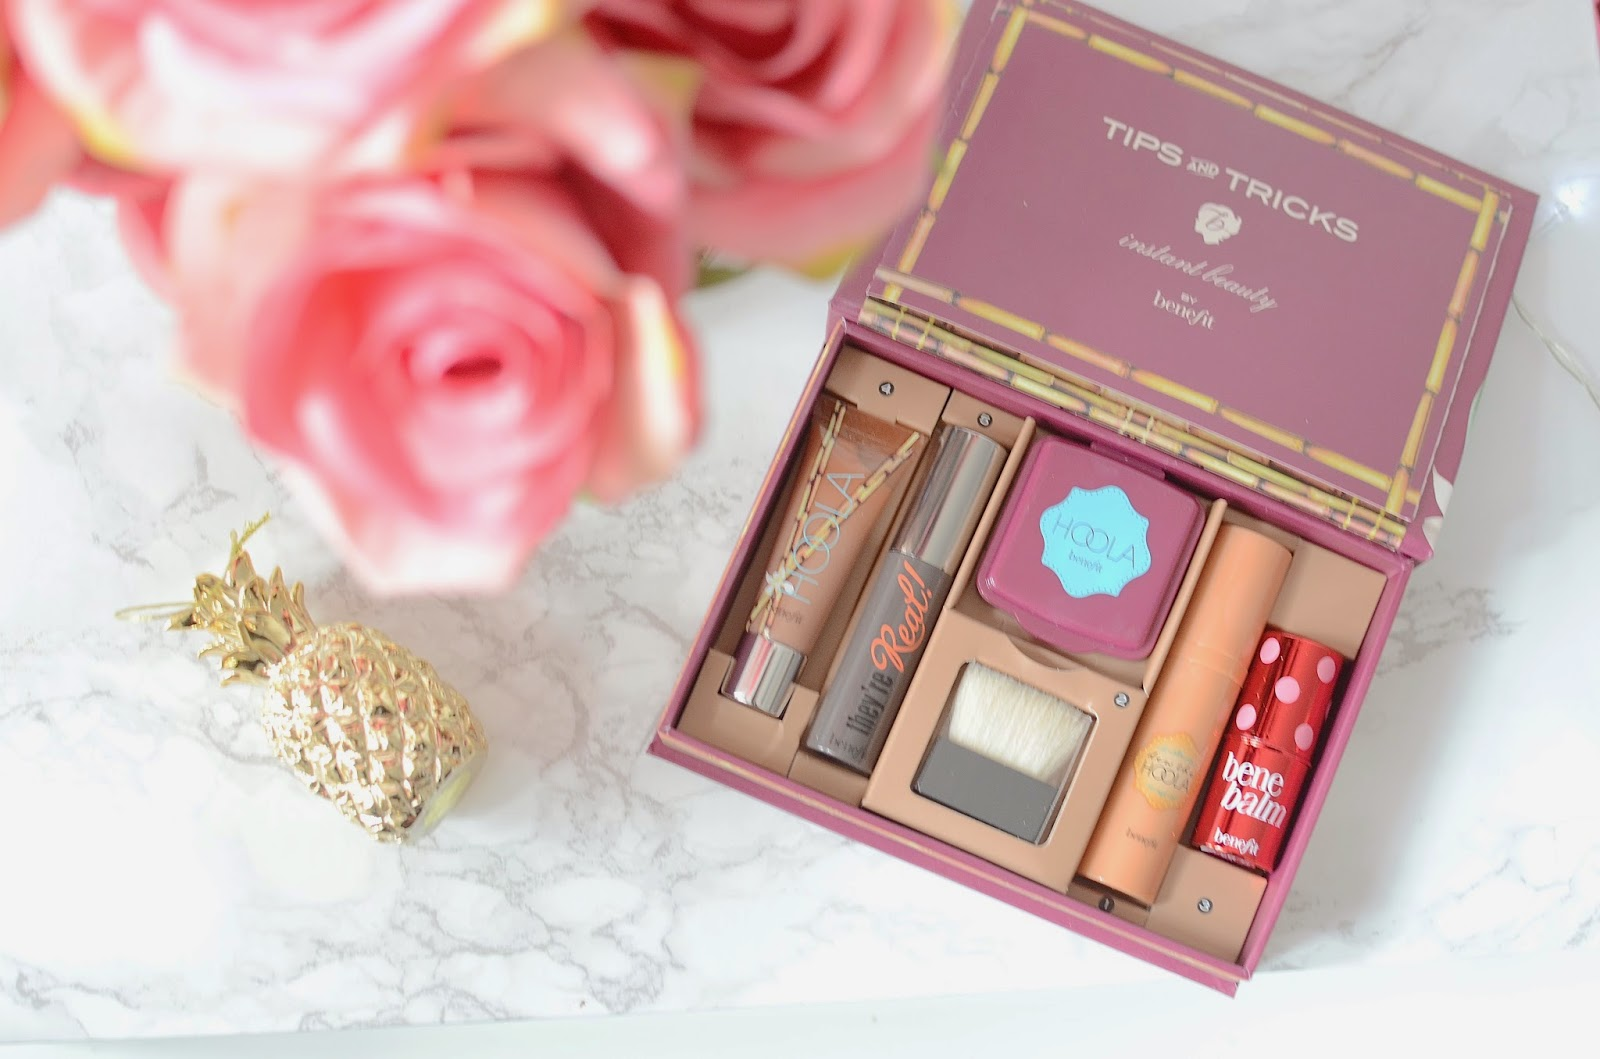 benefit, benefit cosmetics, benefit do the hoola kit, benefit hoola, make up, beauty, bronzer, bronze, summer kit